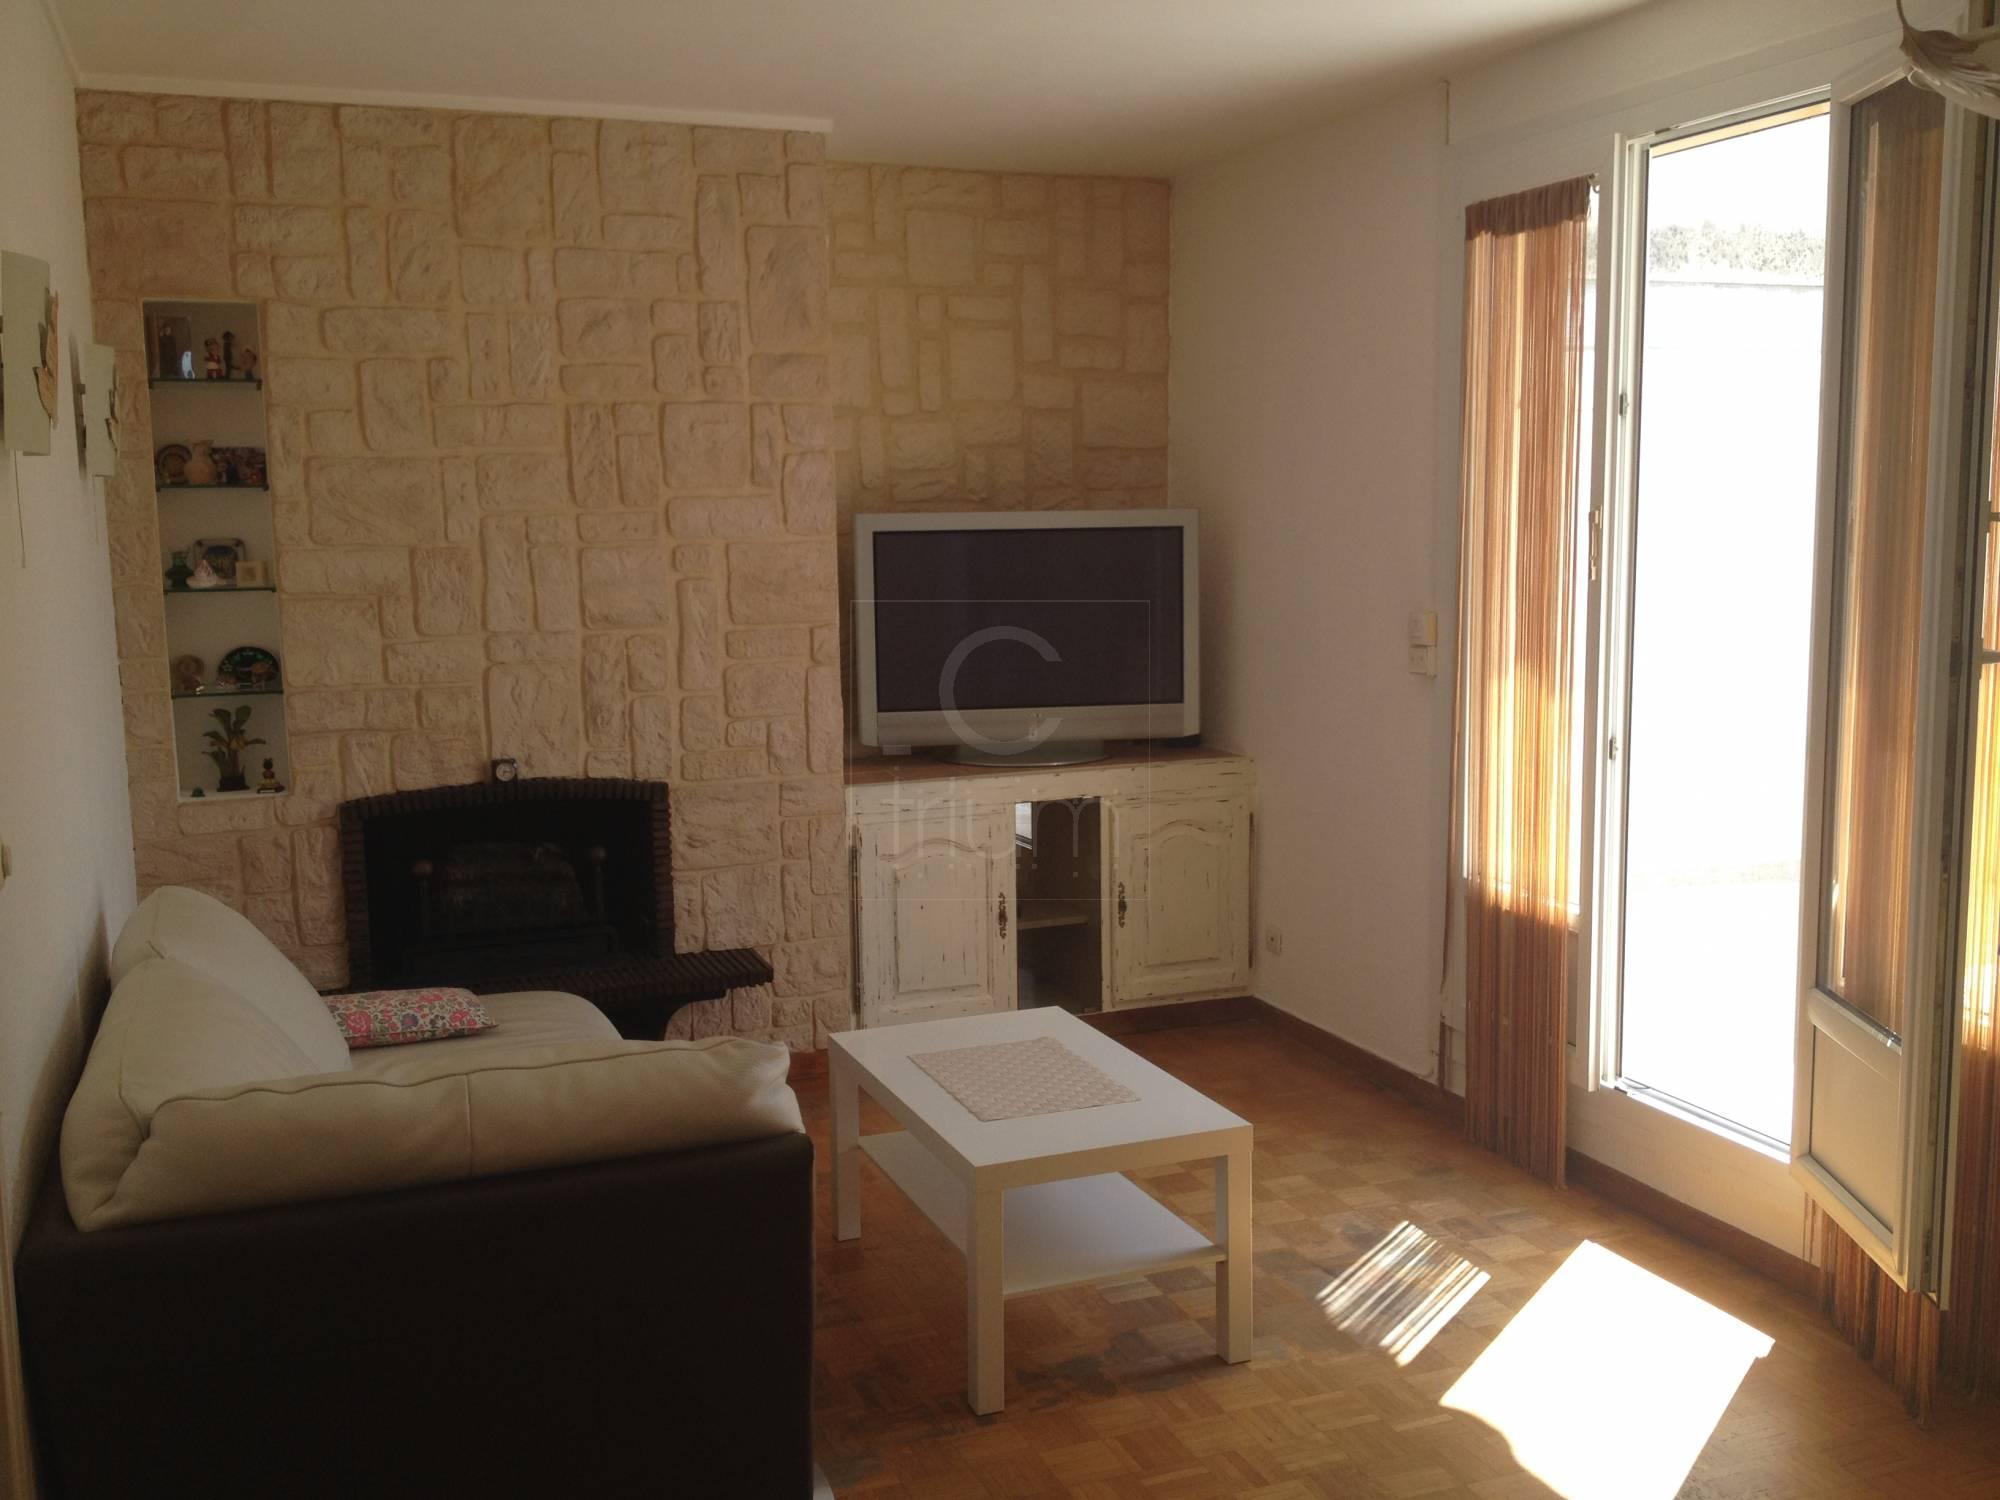 vente appartement t3 f3 marseille 7eme endoume dernier tage avec terrasse agence immobili re. Black Bedroom Furniture Sets. Home Design Ideas